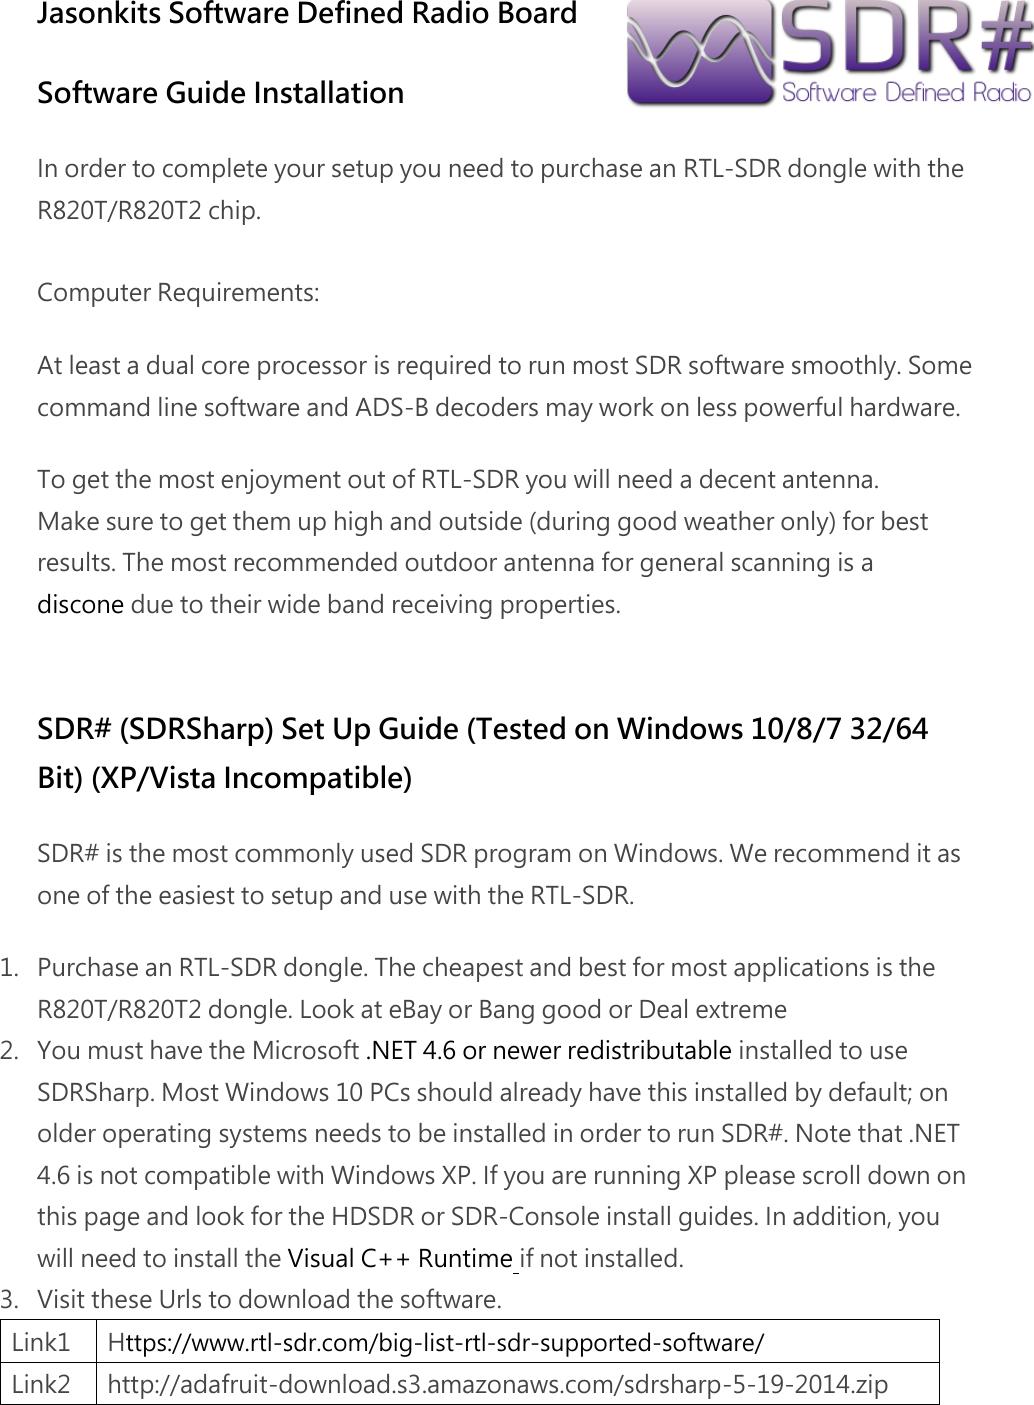 Sdrsharp Windows 10 64 Bit